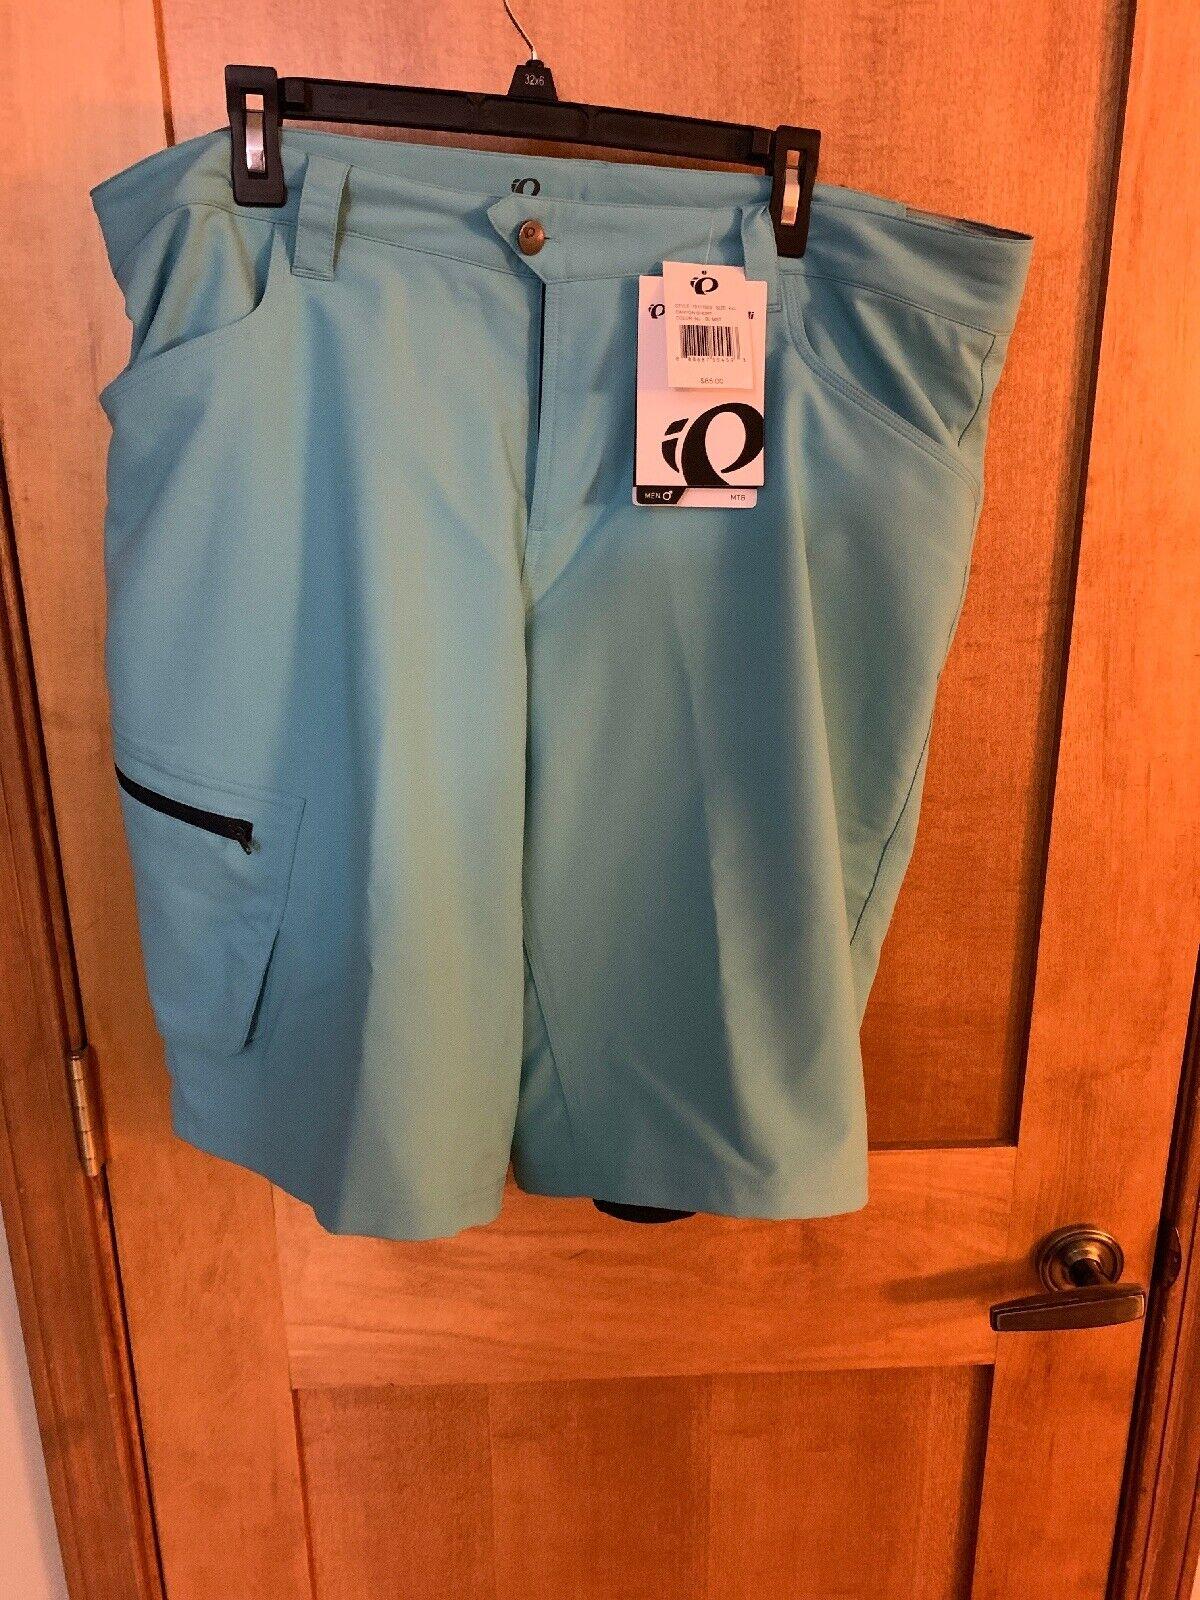 NWT Pearl iZUMi Men's Canyon Shorts  XXLarge  retail  85